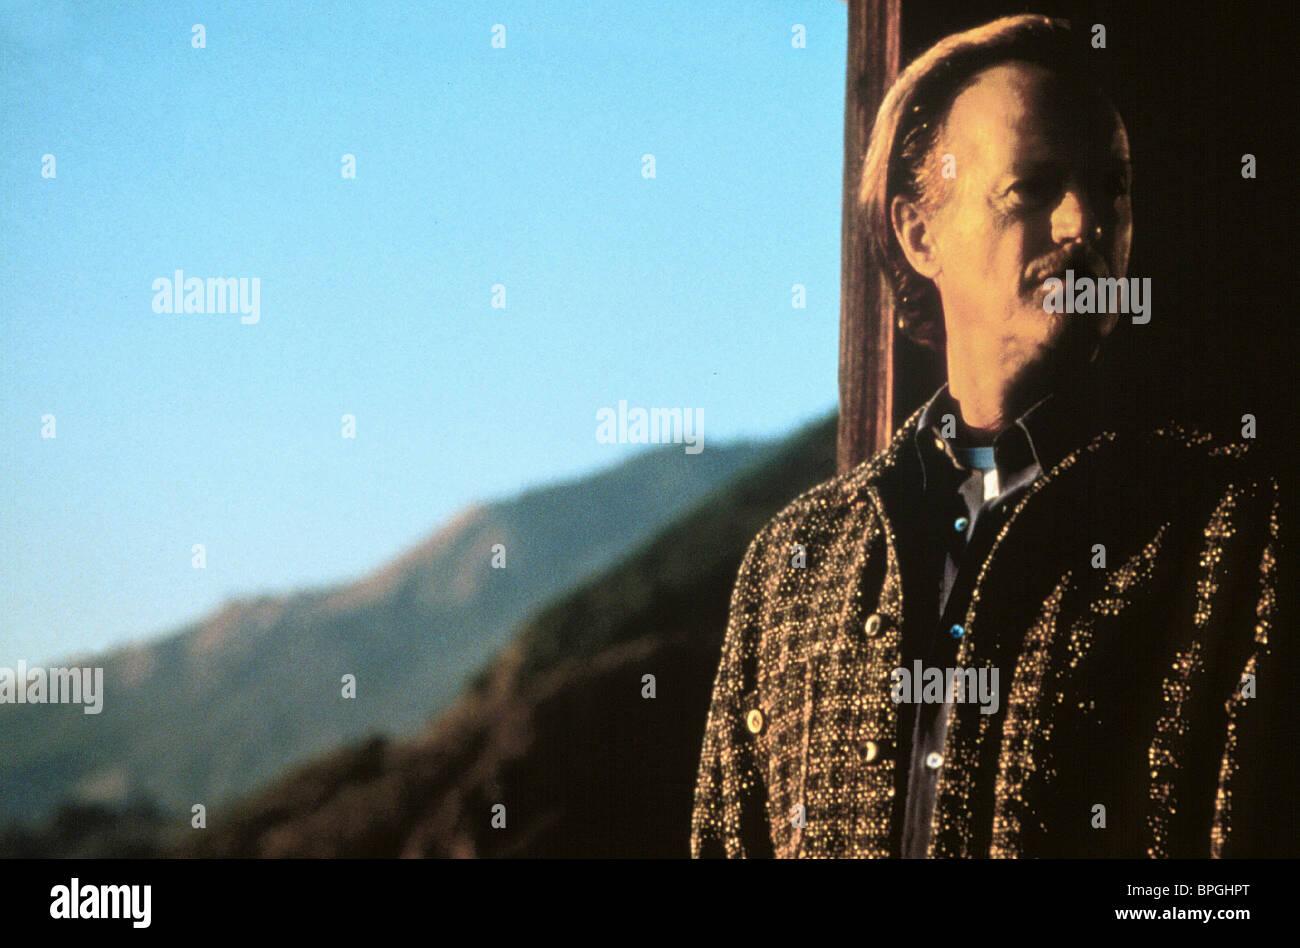 PETER FONDA THE LIMEY (1999) - Stock Image